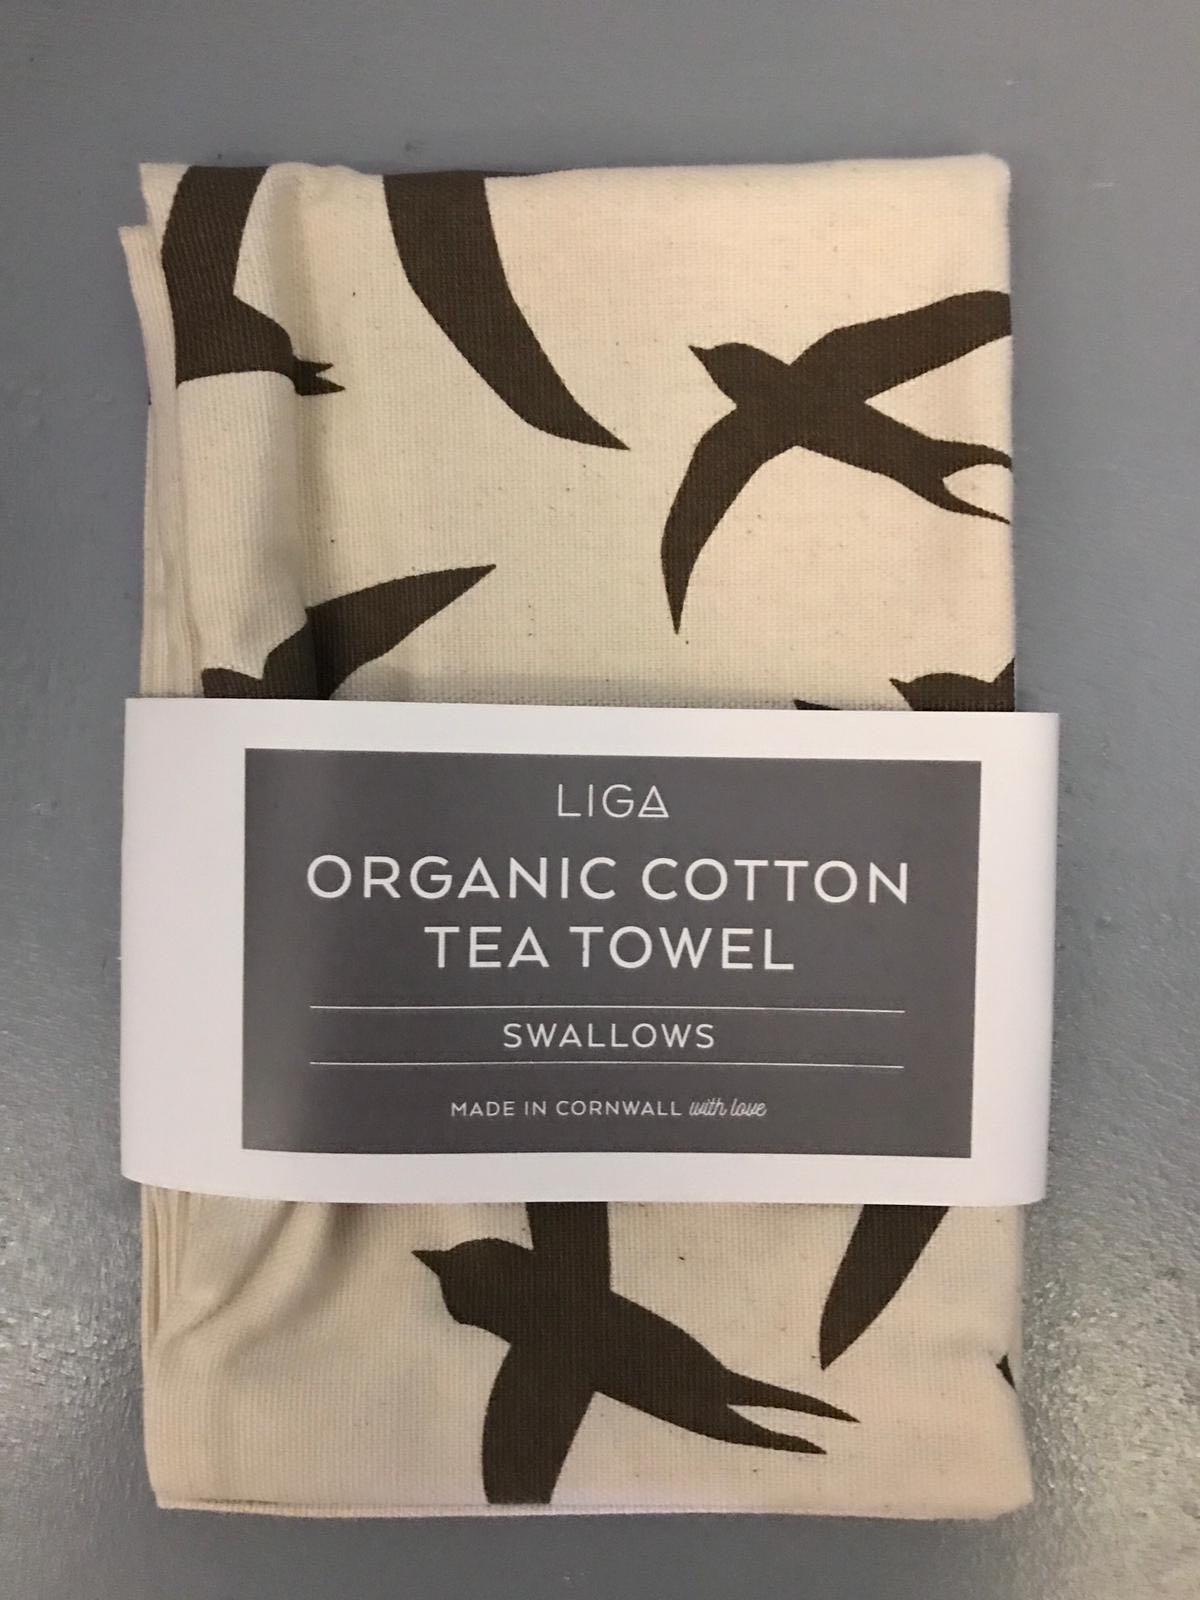 LIGA swallows tea towel